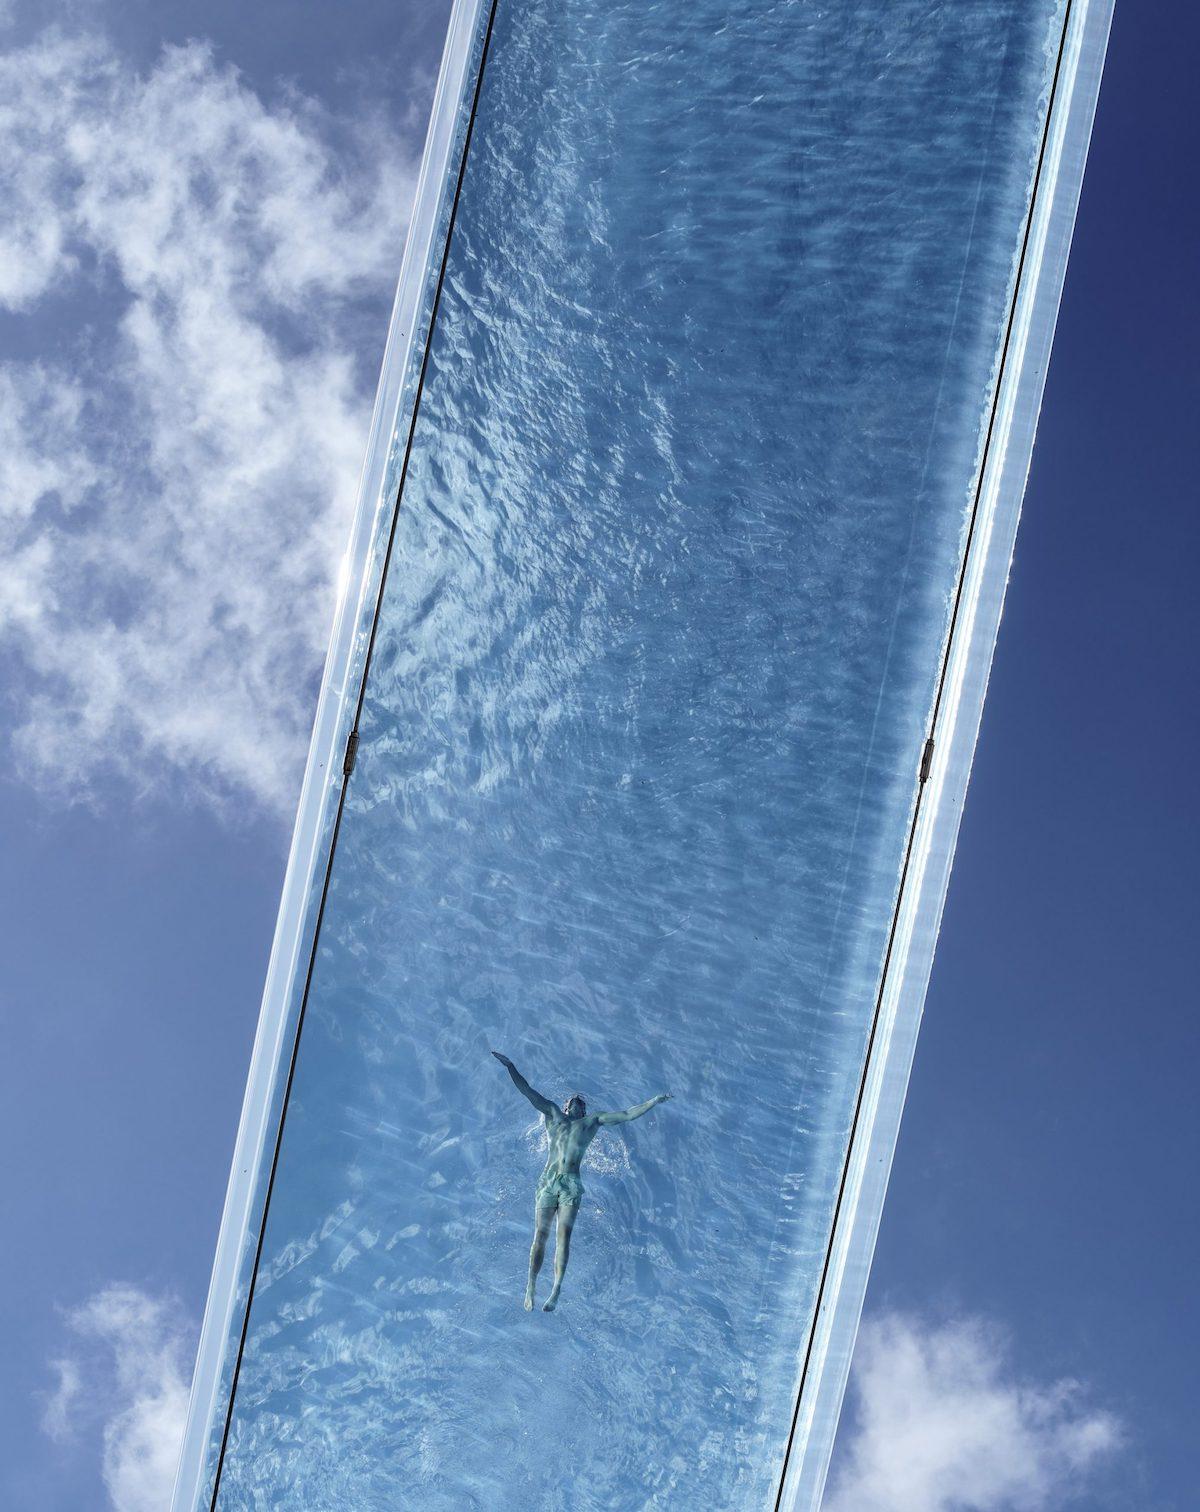 Sky Pool captured by Simon Kennedy